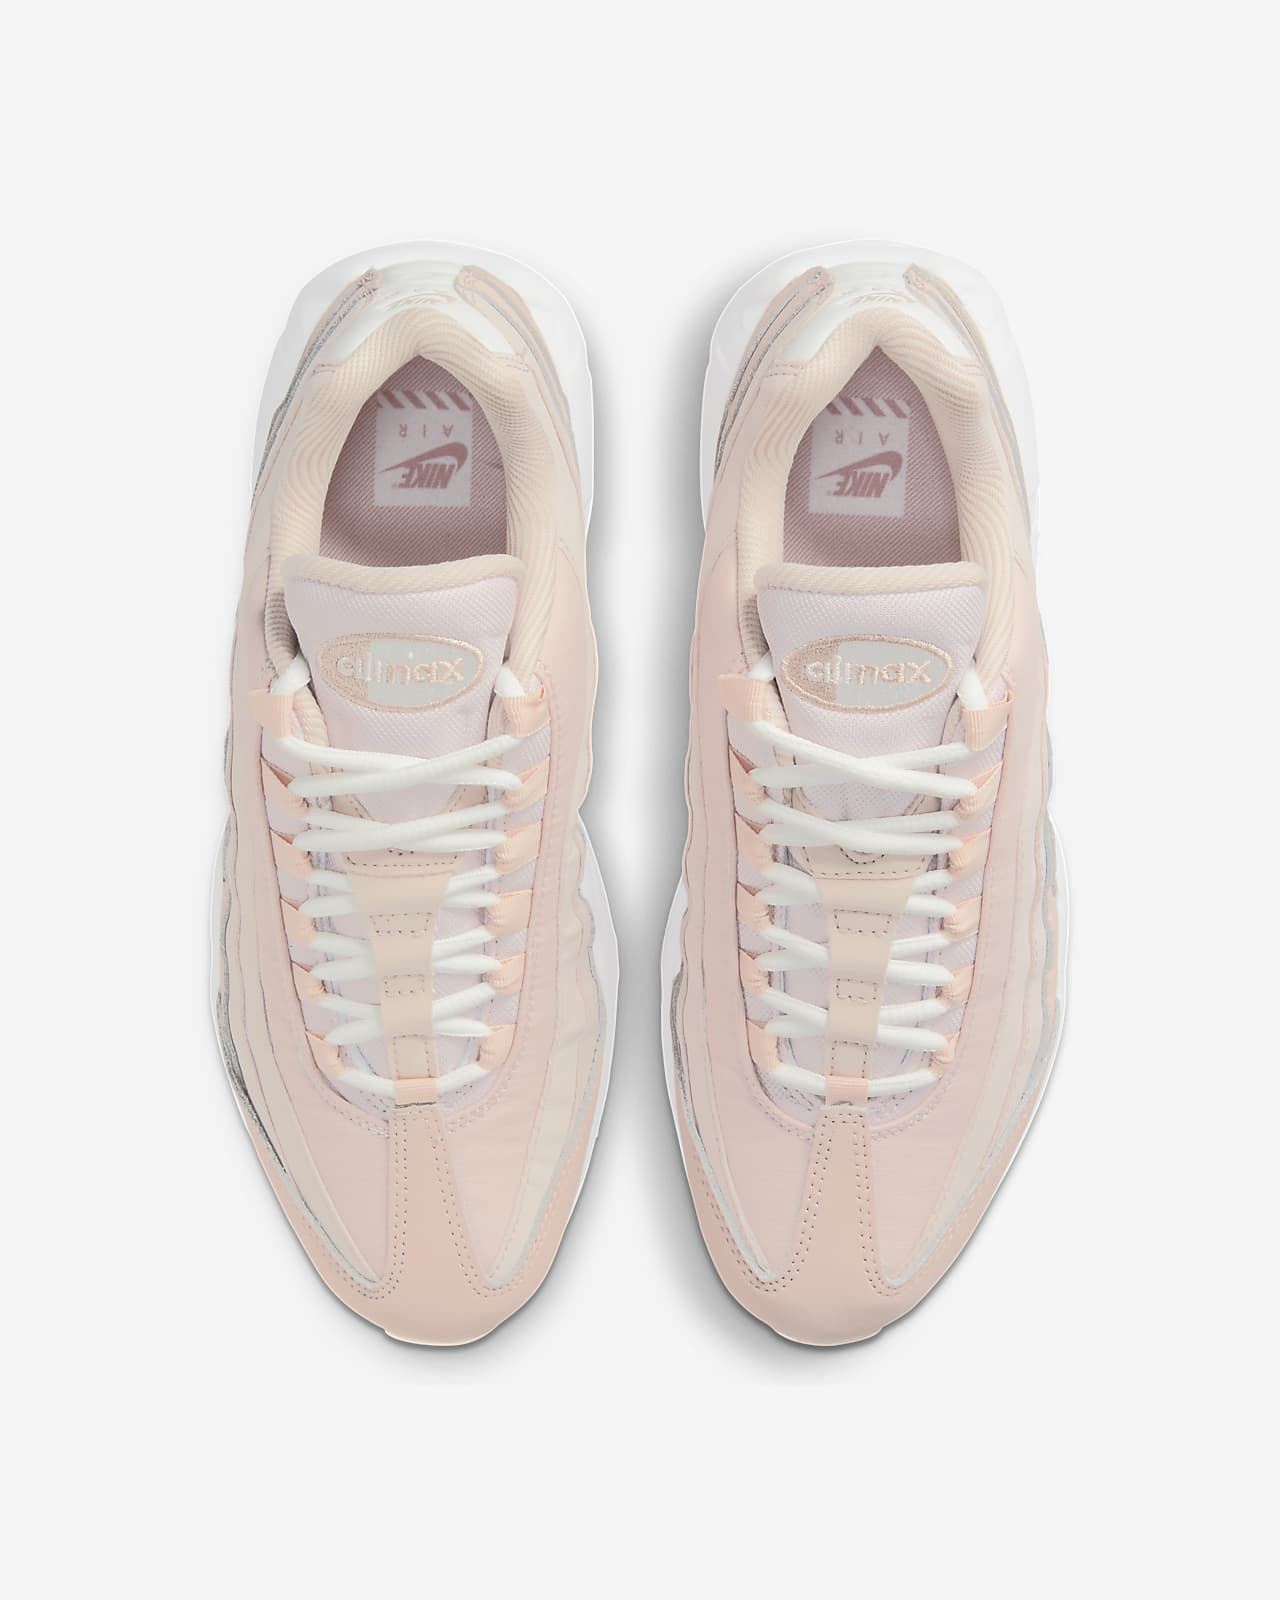 Nike Air Max 95 Women's Shoes. Nike LU